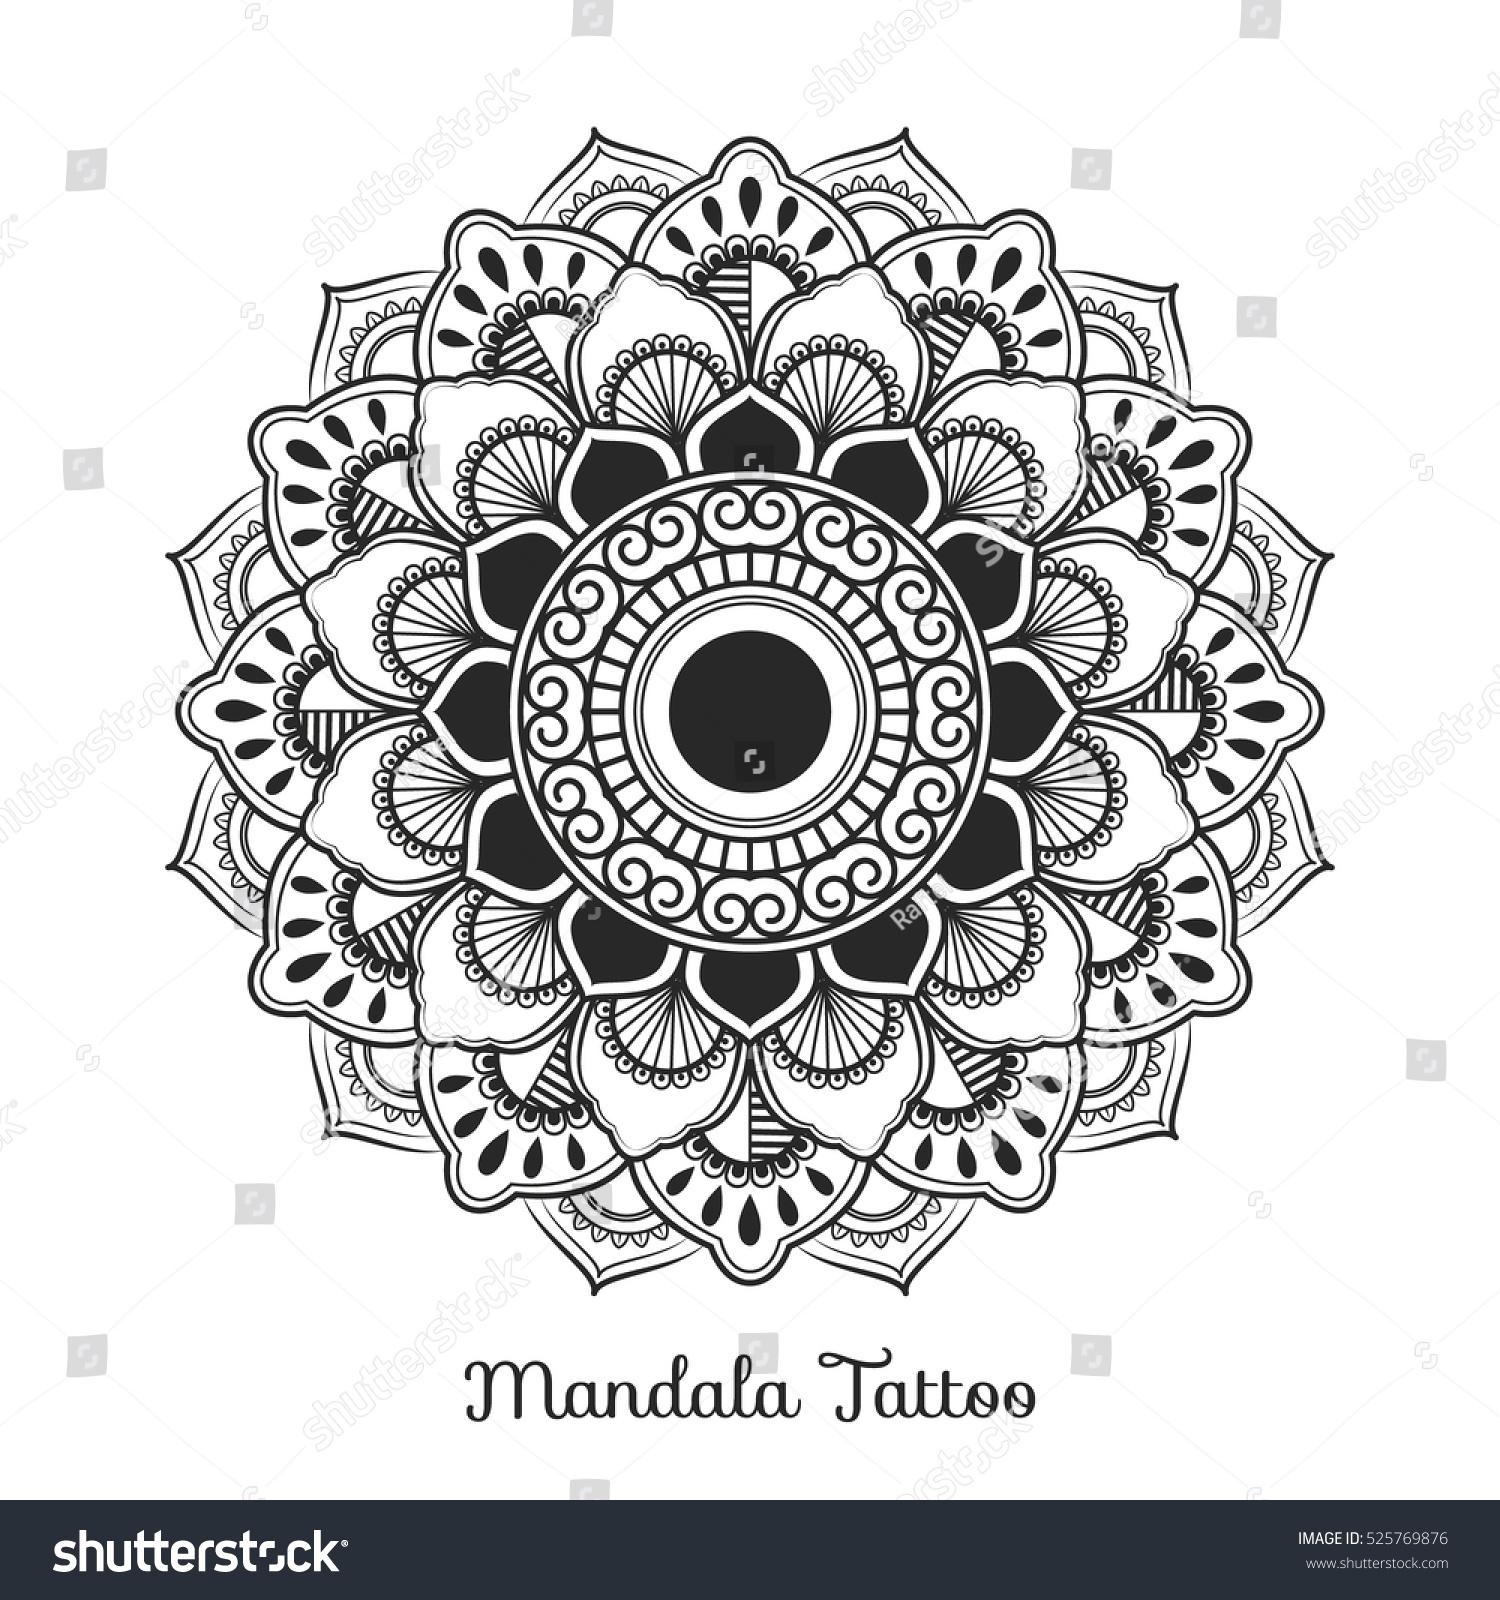 mandala decorative ornament design coloring page stock vector